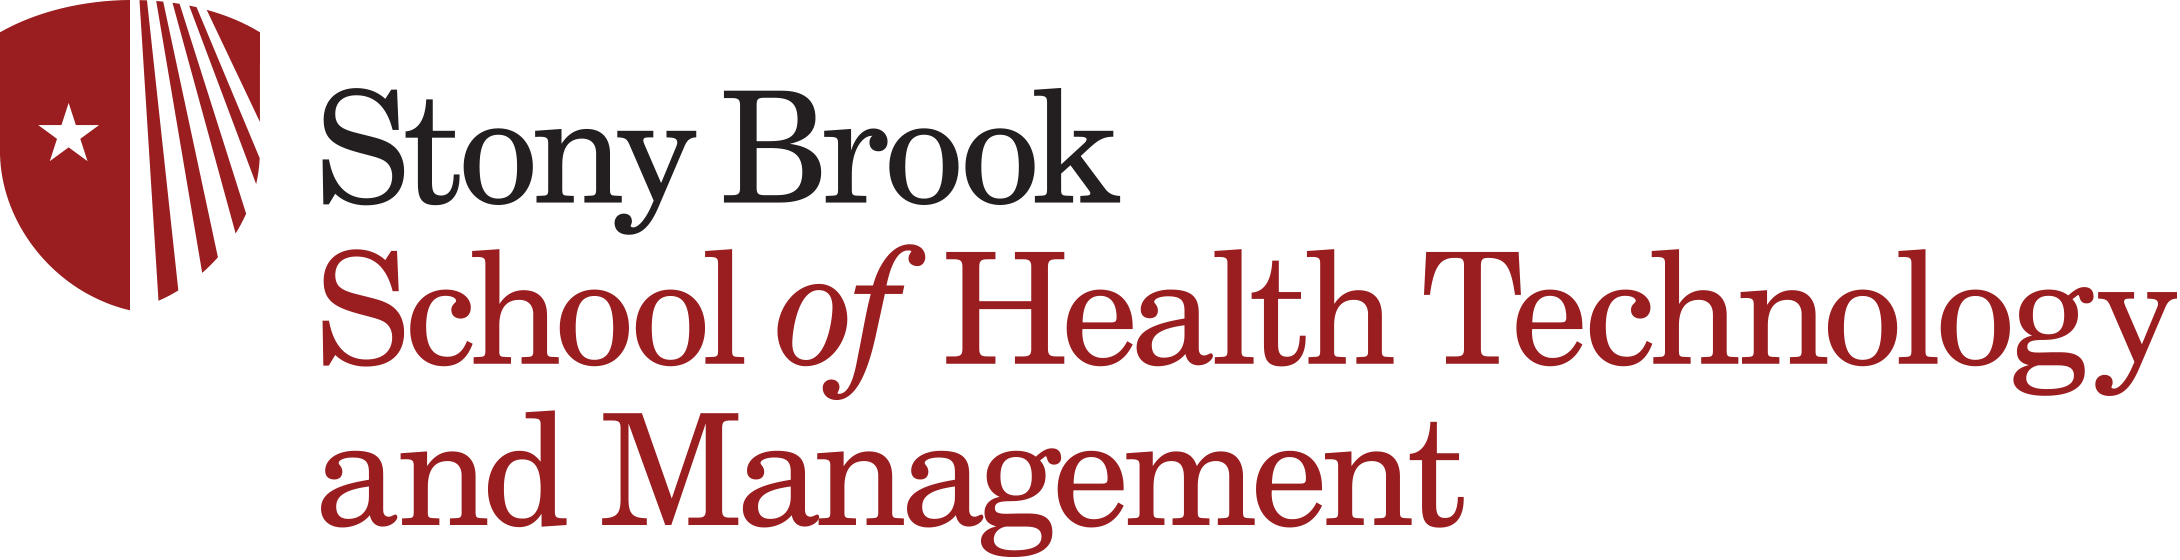 Stony brook supplemental essay